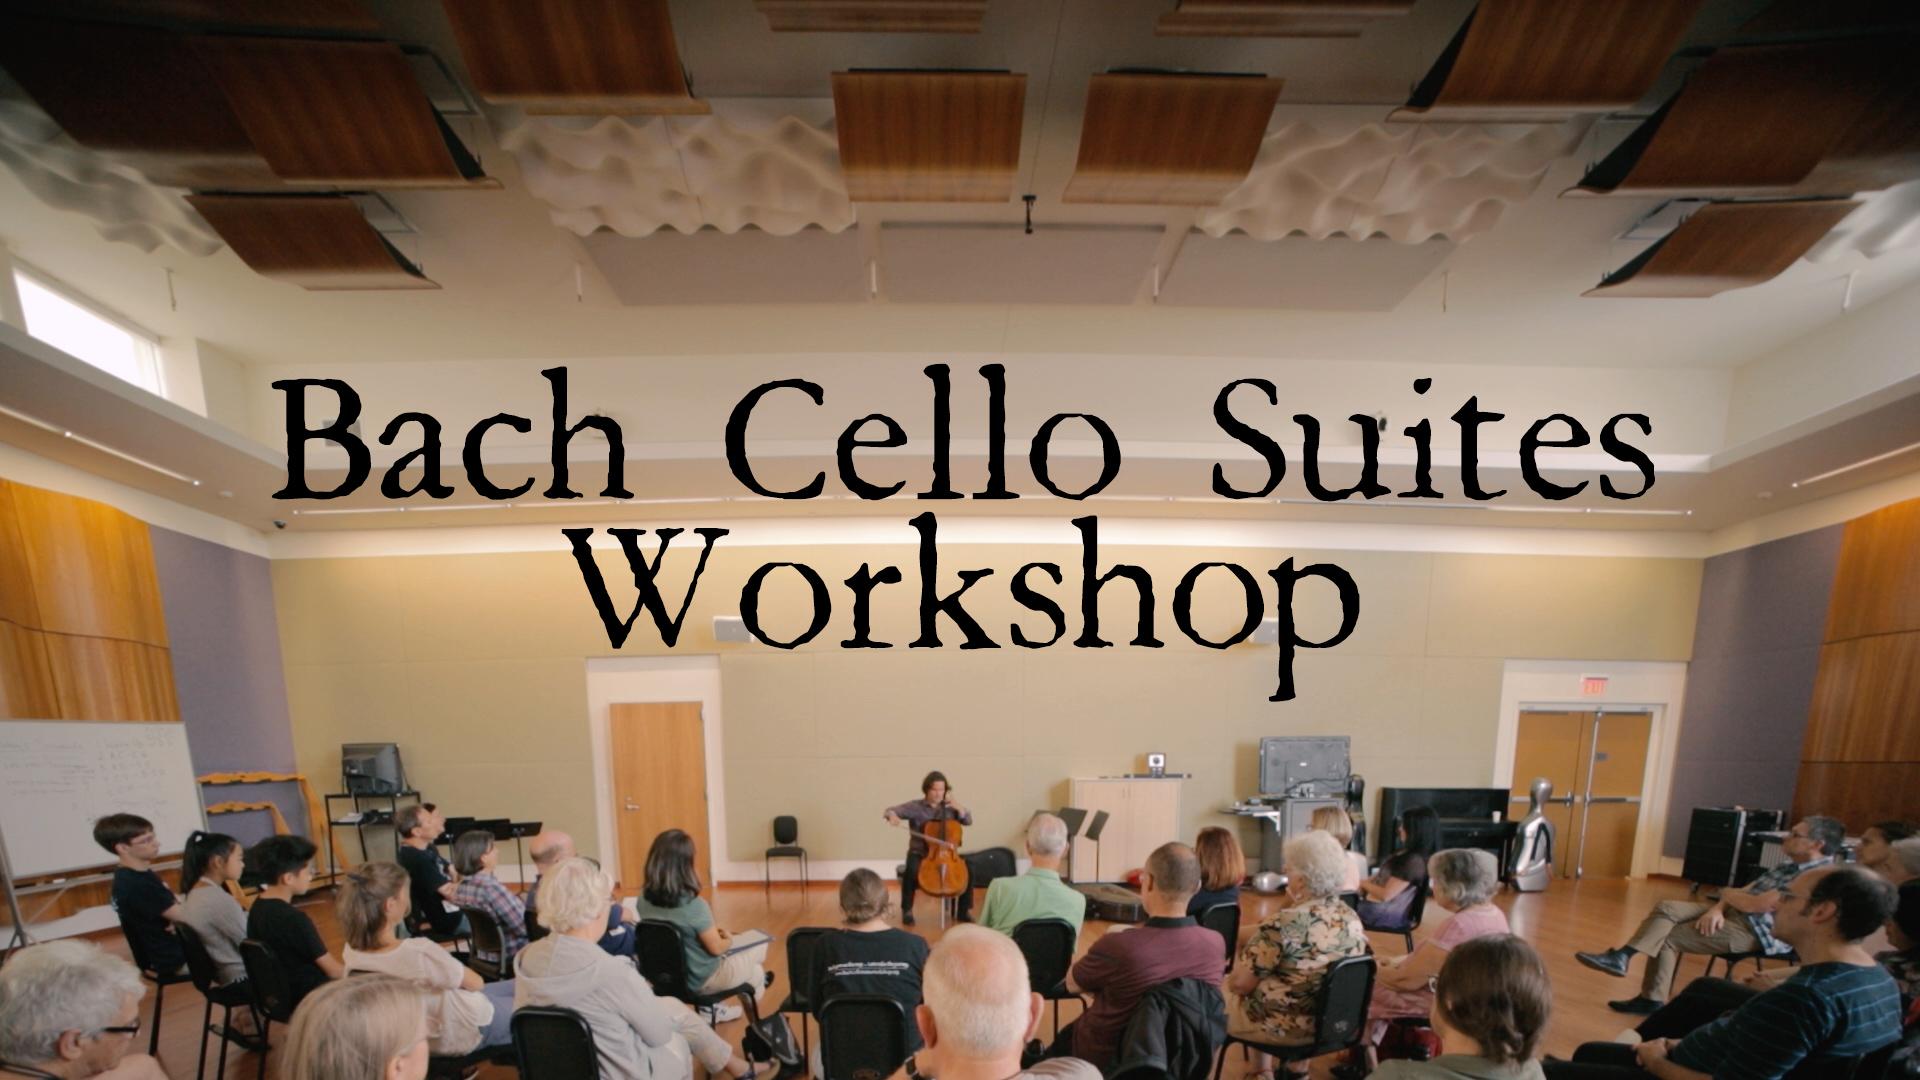 Bach Cello Suites Workshop, Faculty Feature, Camera, Edit 2018